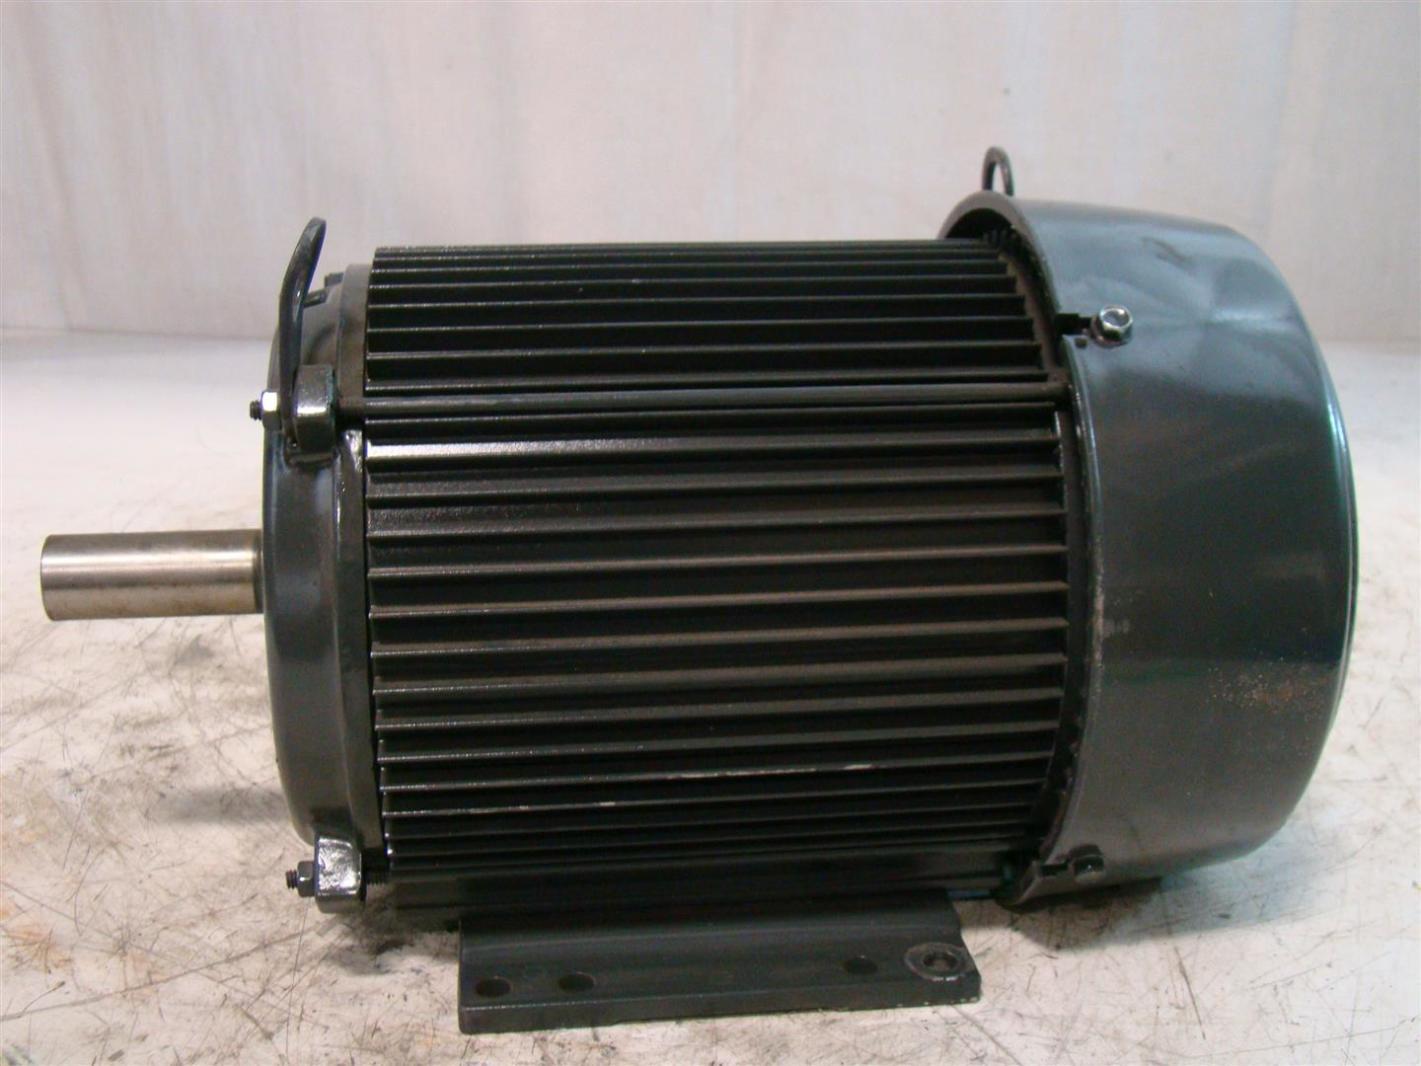 Usmotors 3hp 3540rpm Electric Motor 208 230 460v U3p1d